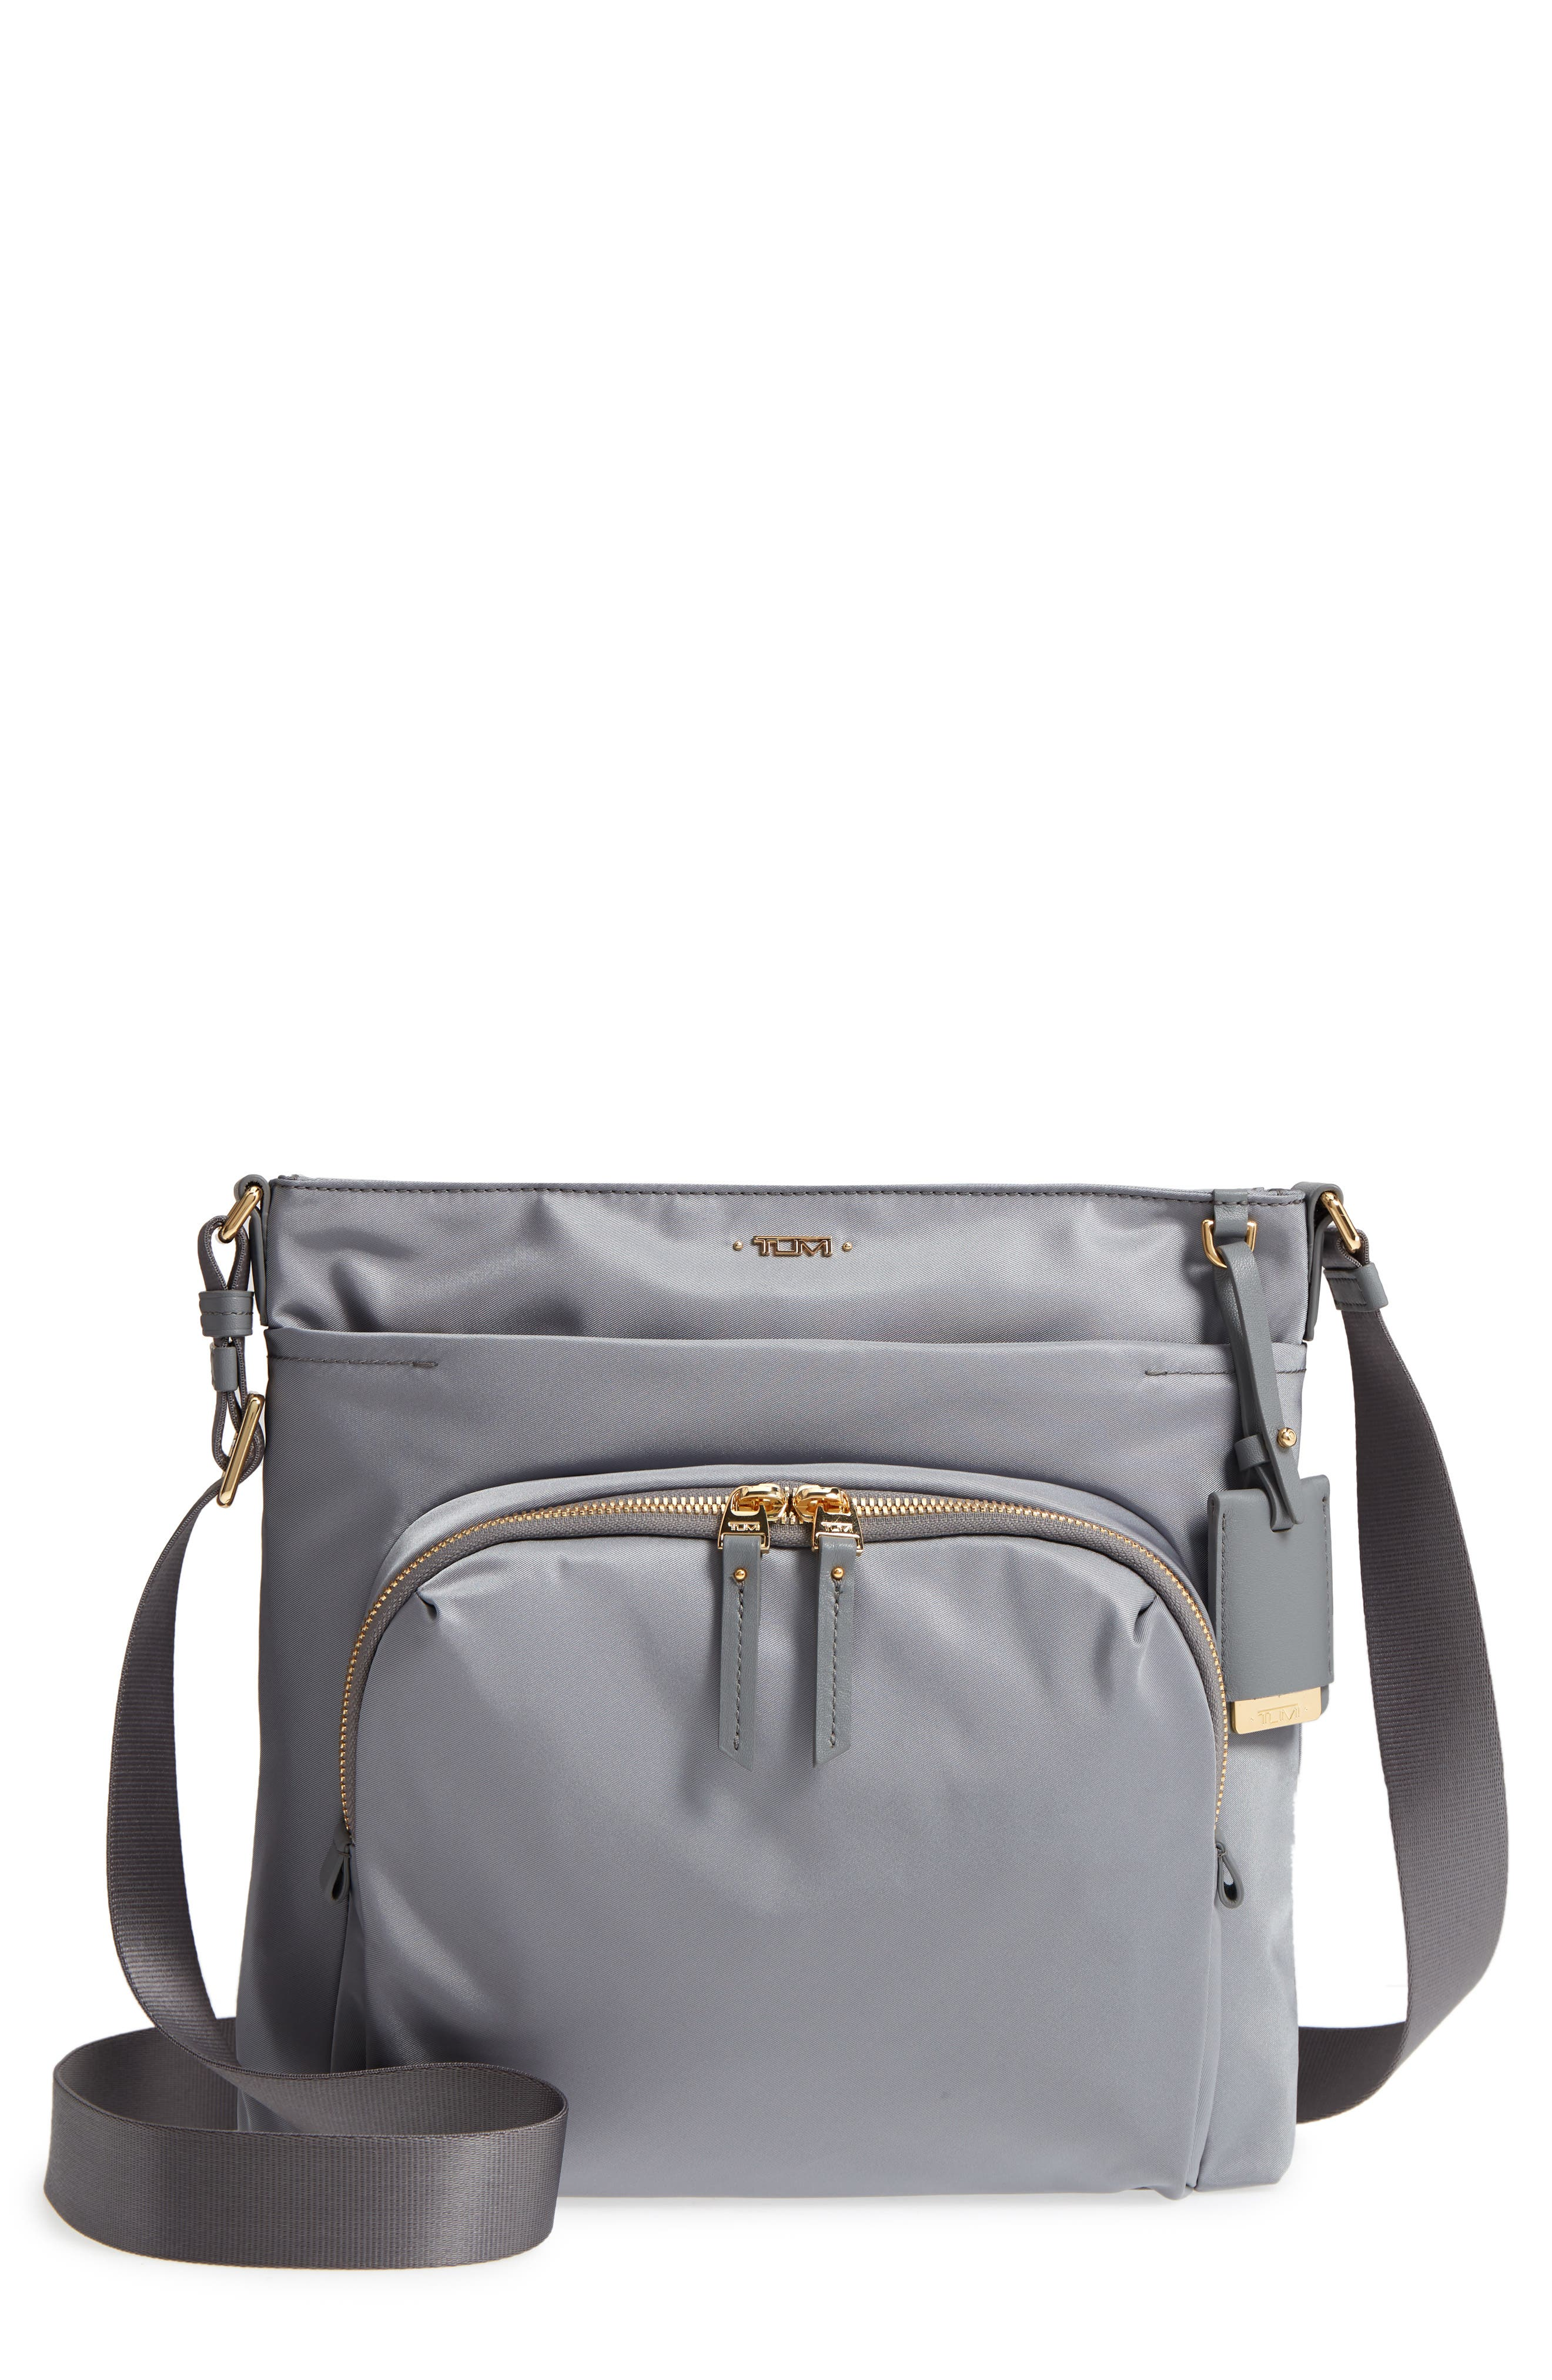 Voyager - Capri Nylon Crossbody Bag,                             Main thumbnail 1, color,                             020